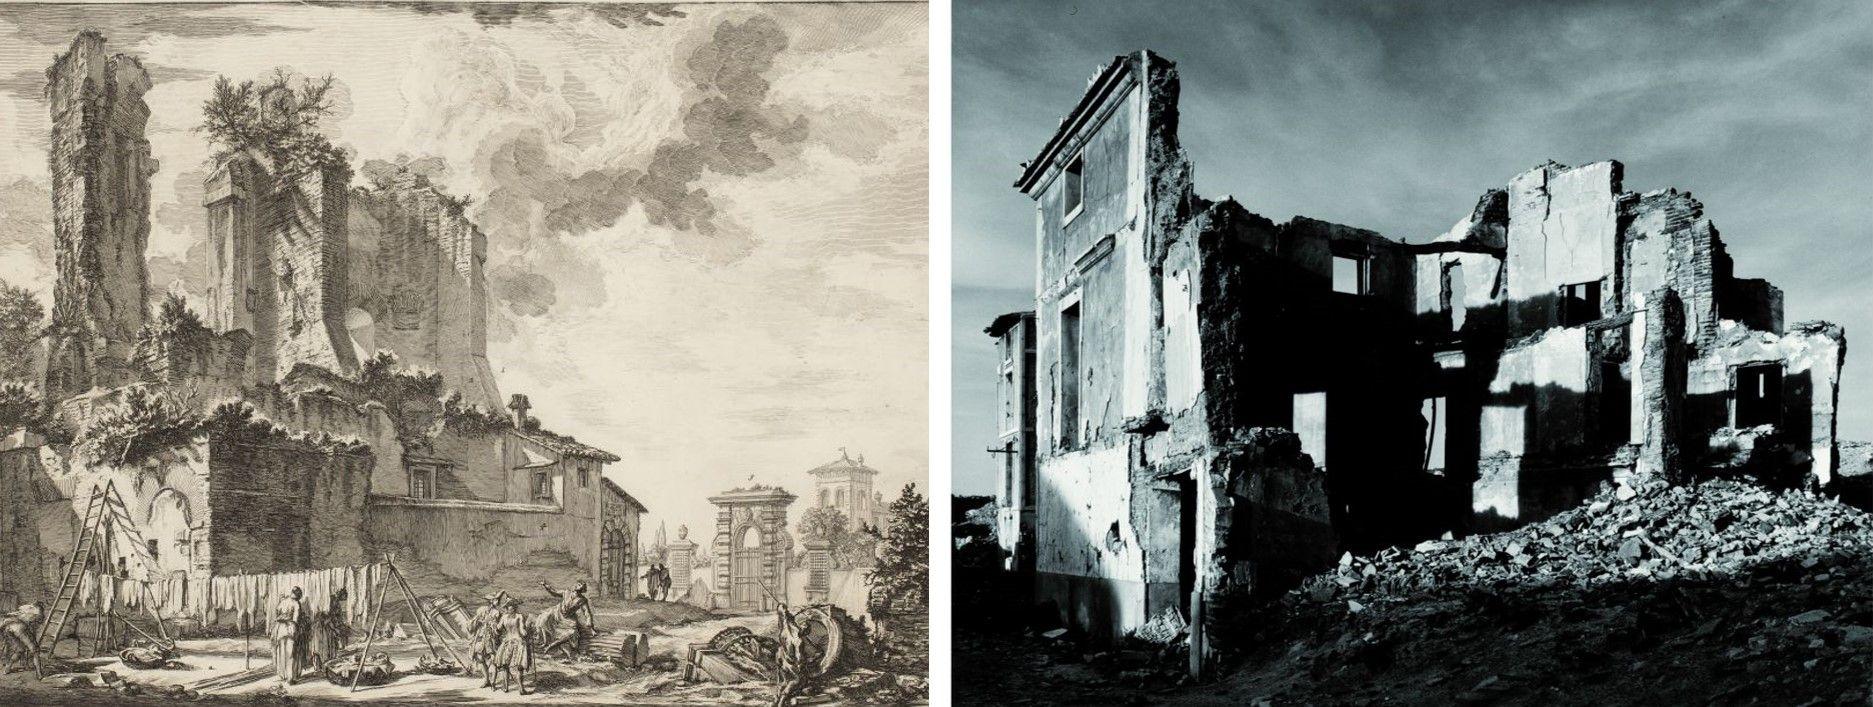 El gravat de Piranesi i la fotografia d'Humberto Rivas a Artur Ramon Art